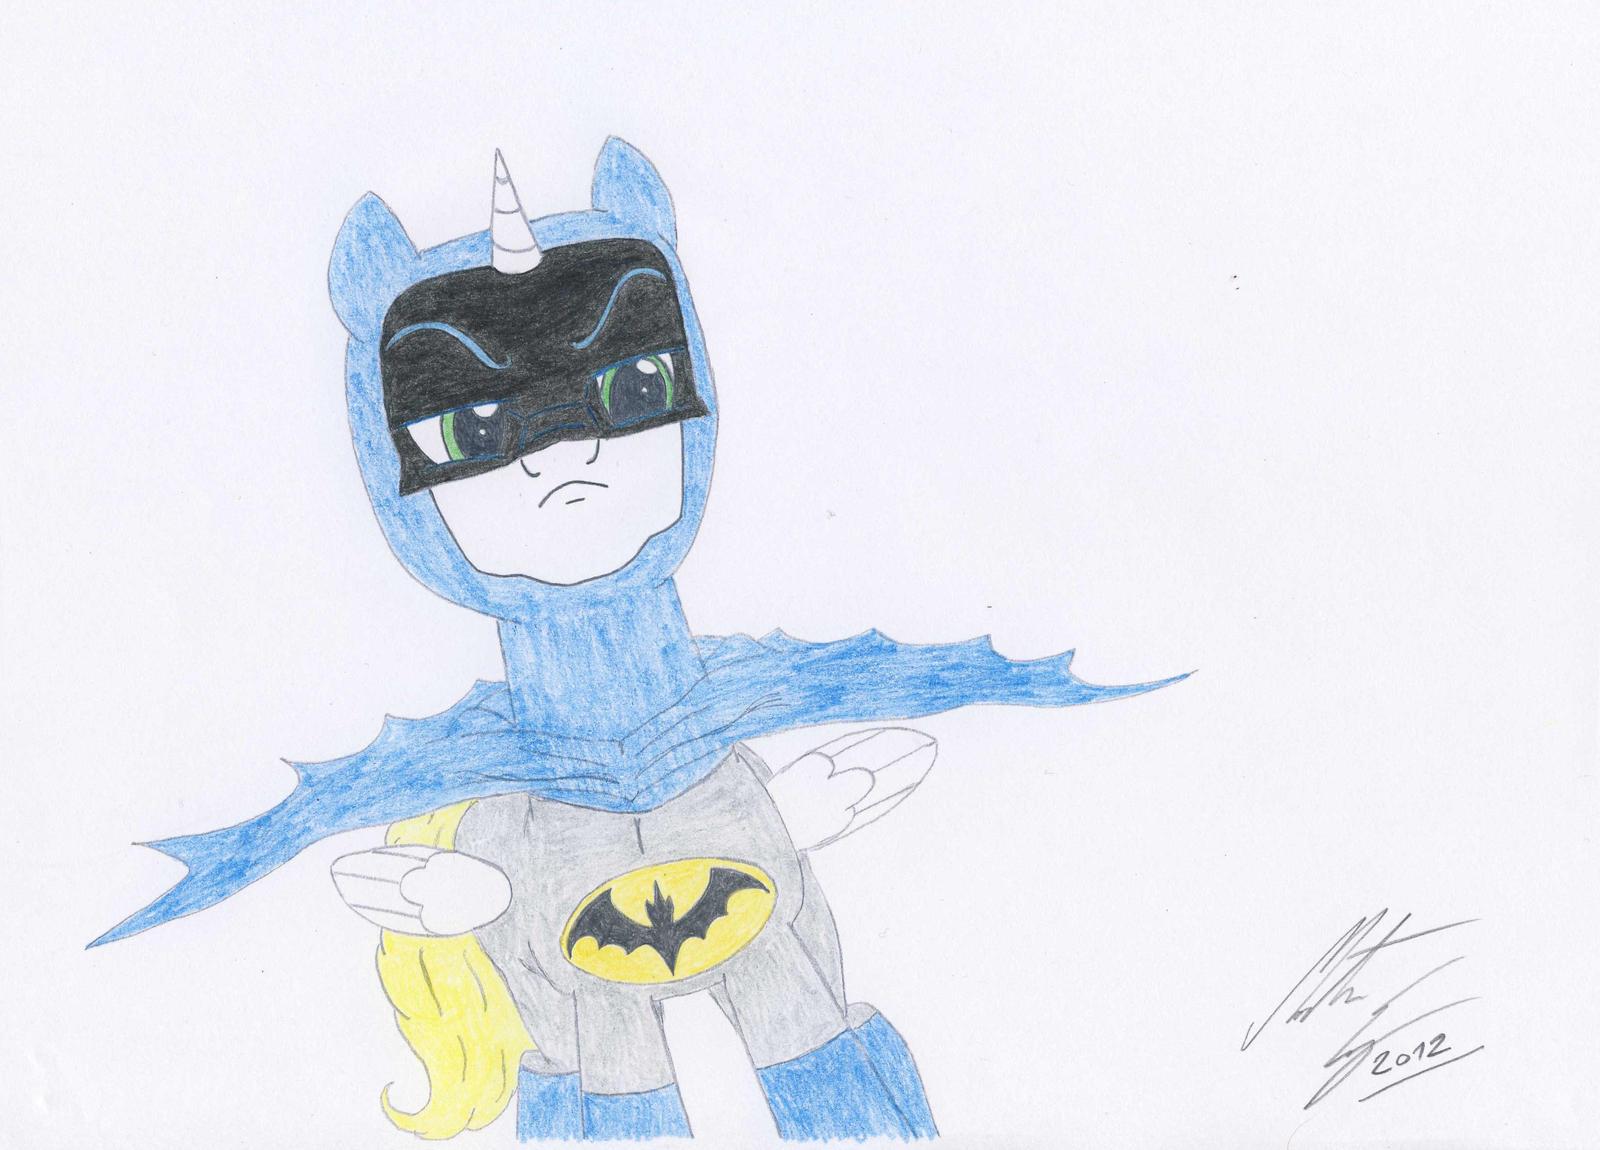 MLP:FiM - Batpony by MortenEng21